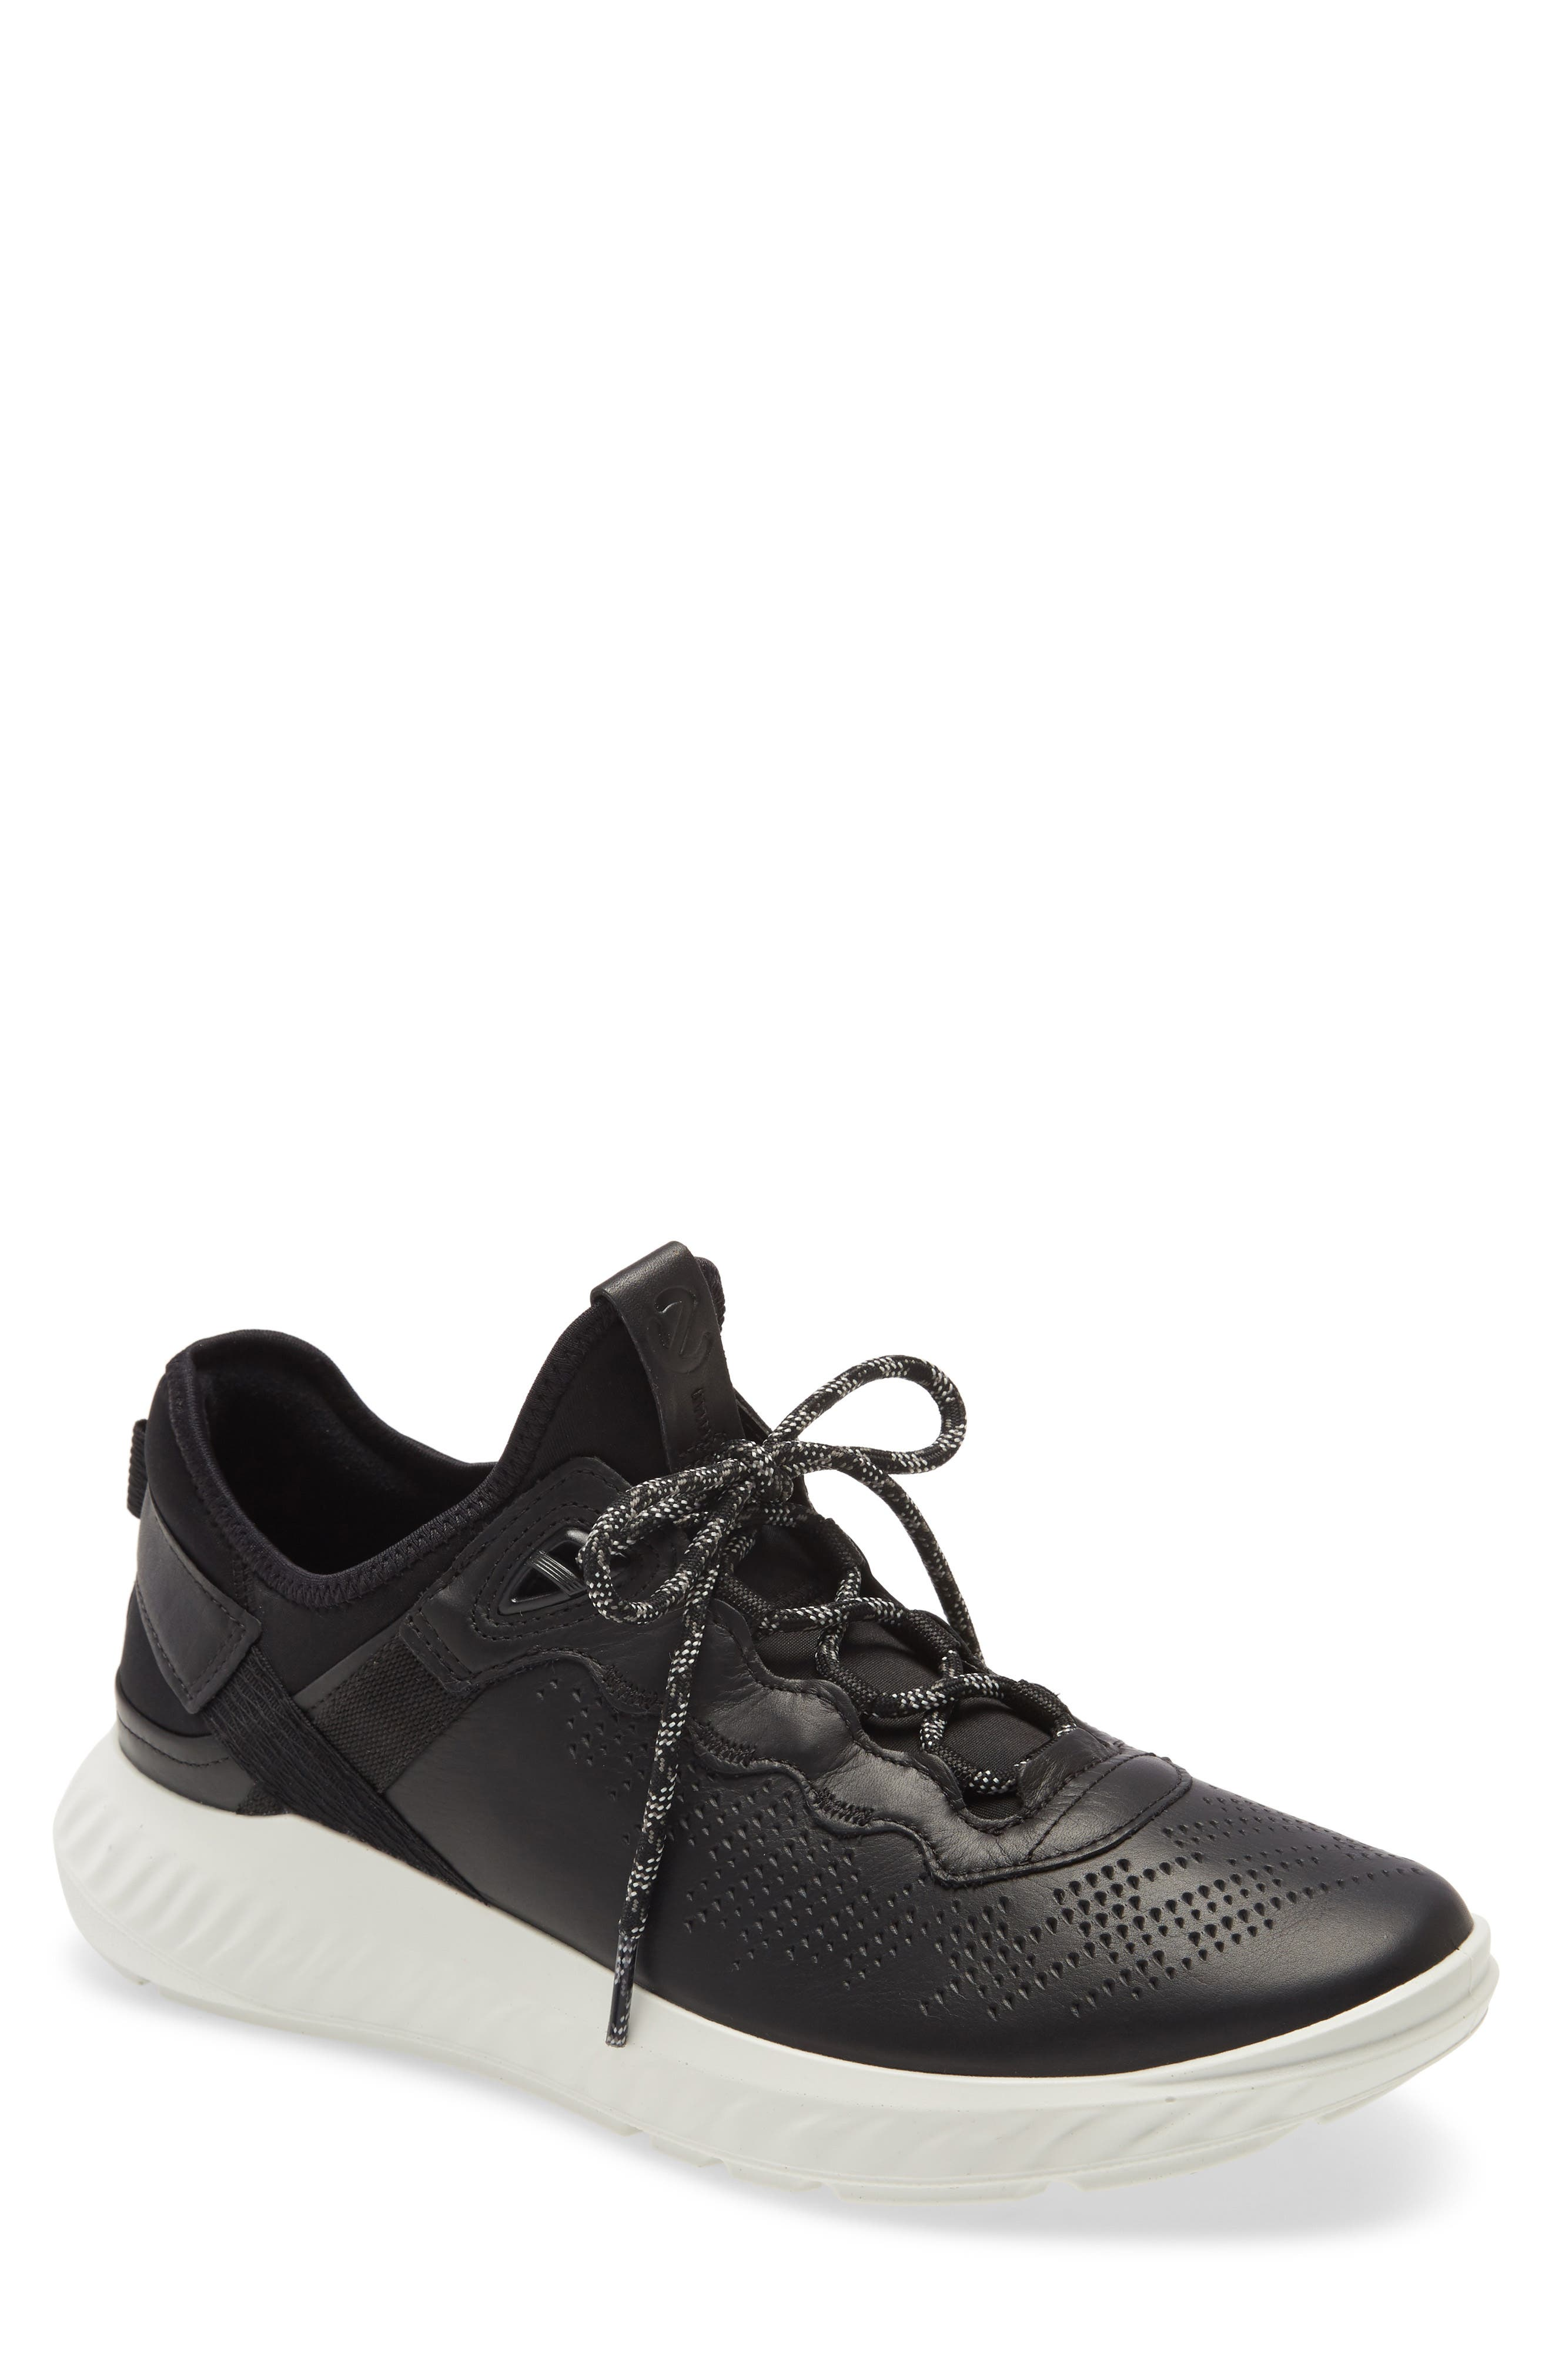 Men's Ecco St.1 Lite Sneaker